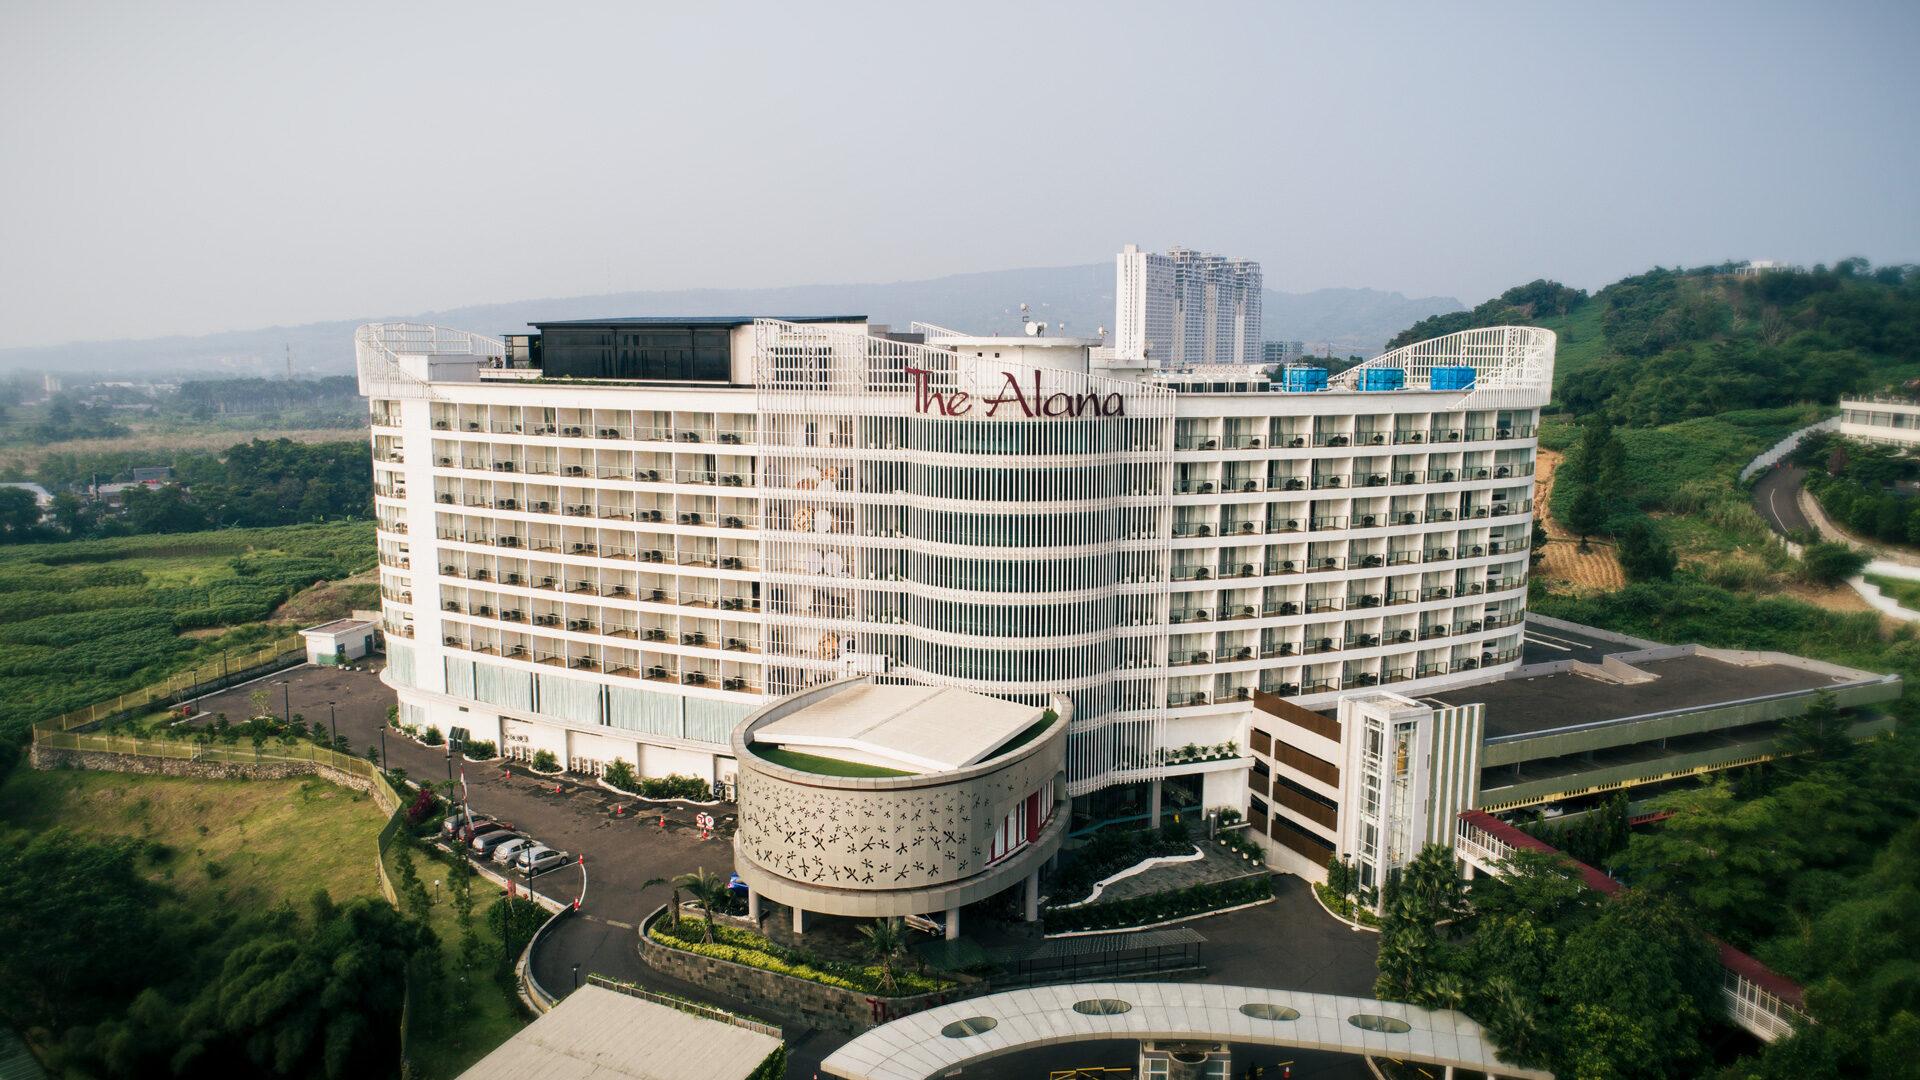 Jasa Foto dan Video Udara Bogor Sky - Alana Hotel